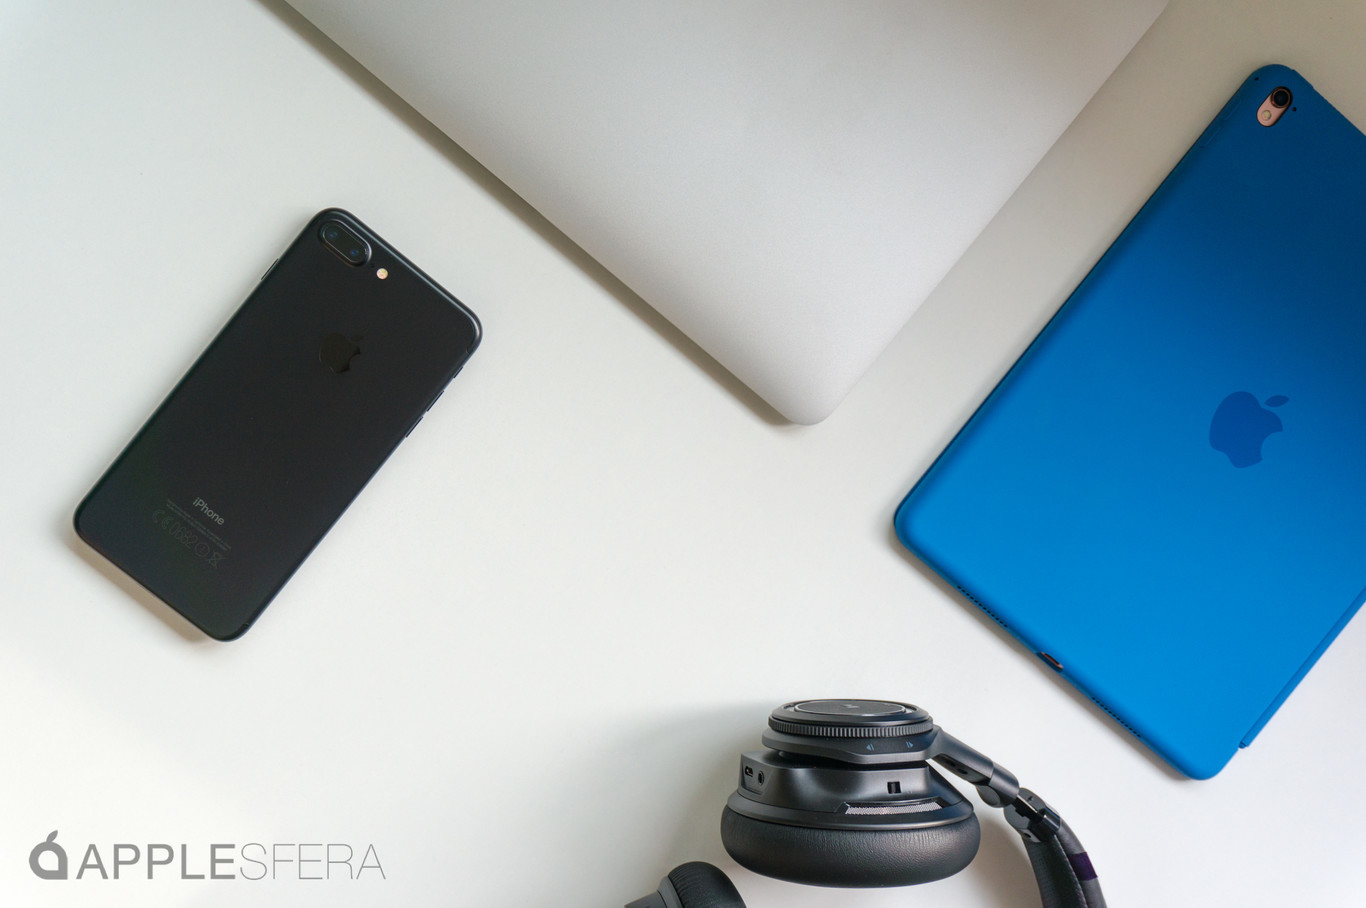 ¿iOS 11 consume mucha batería en tu iPhone? 7+1 trucos para mantenerla a raya